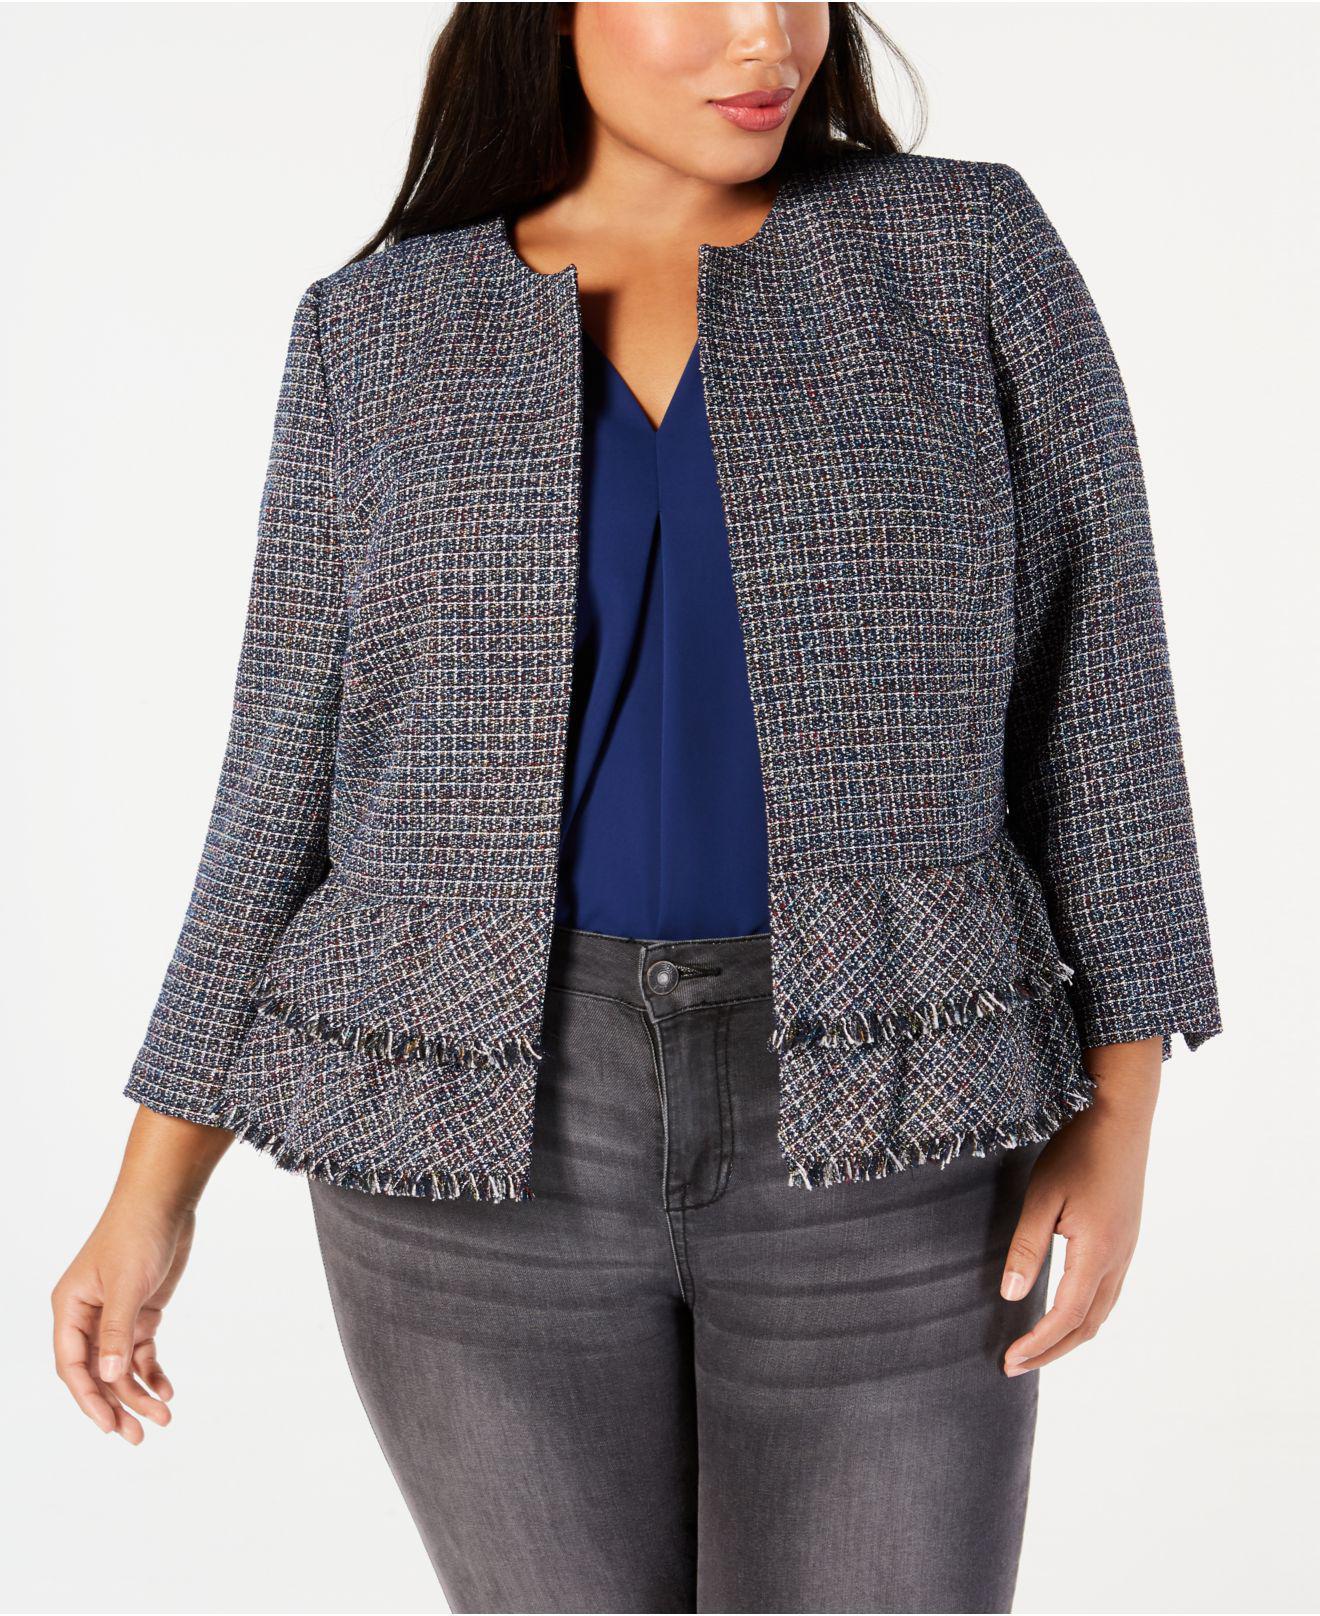 5687fc802f2 Lyst - Nine West Plus Size Tweed Peplum Hem Jacket in Gray